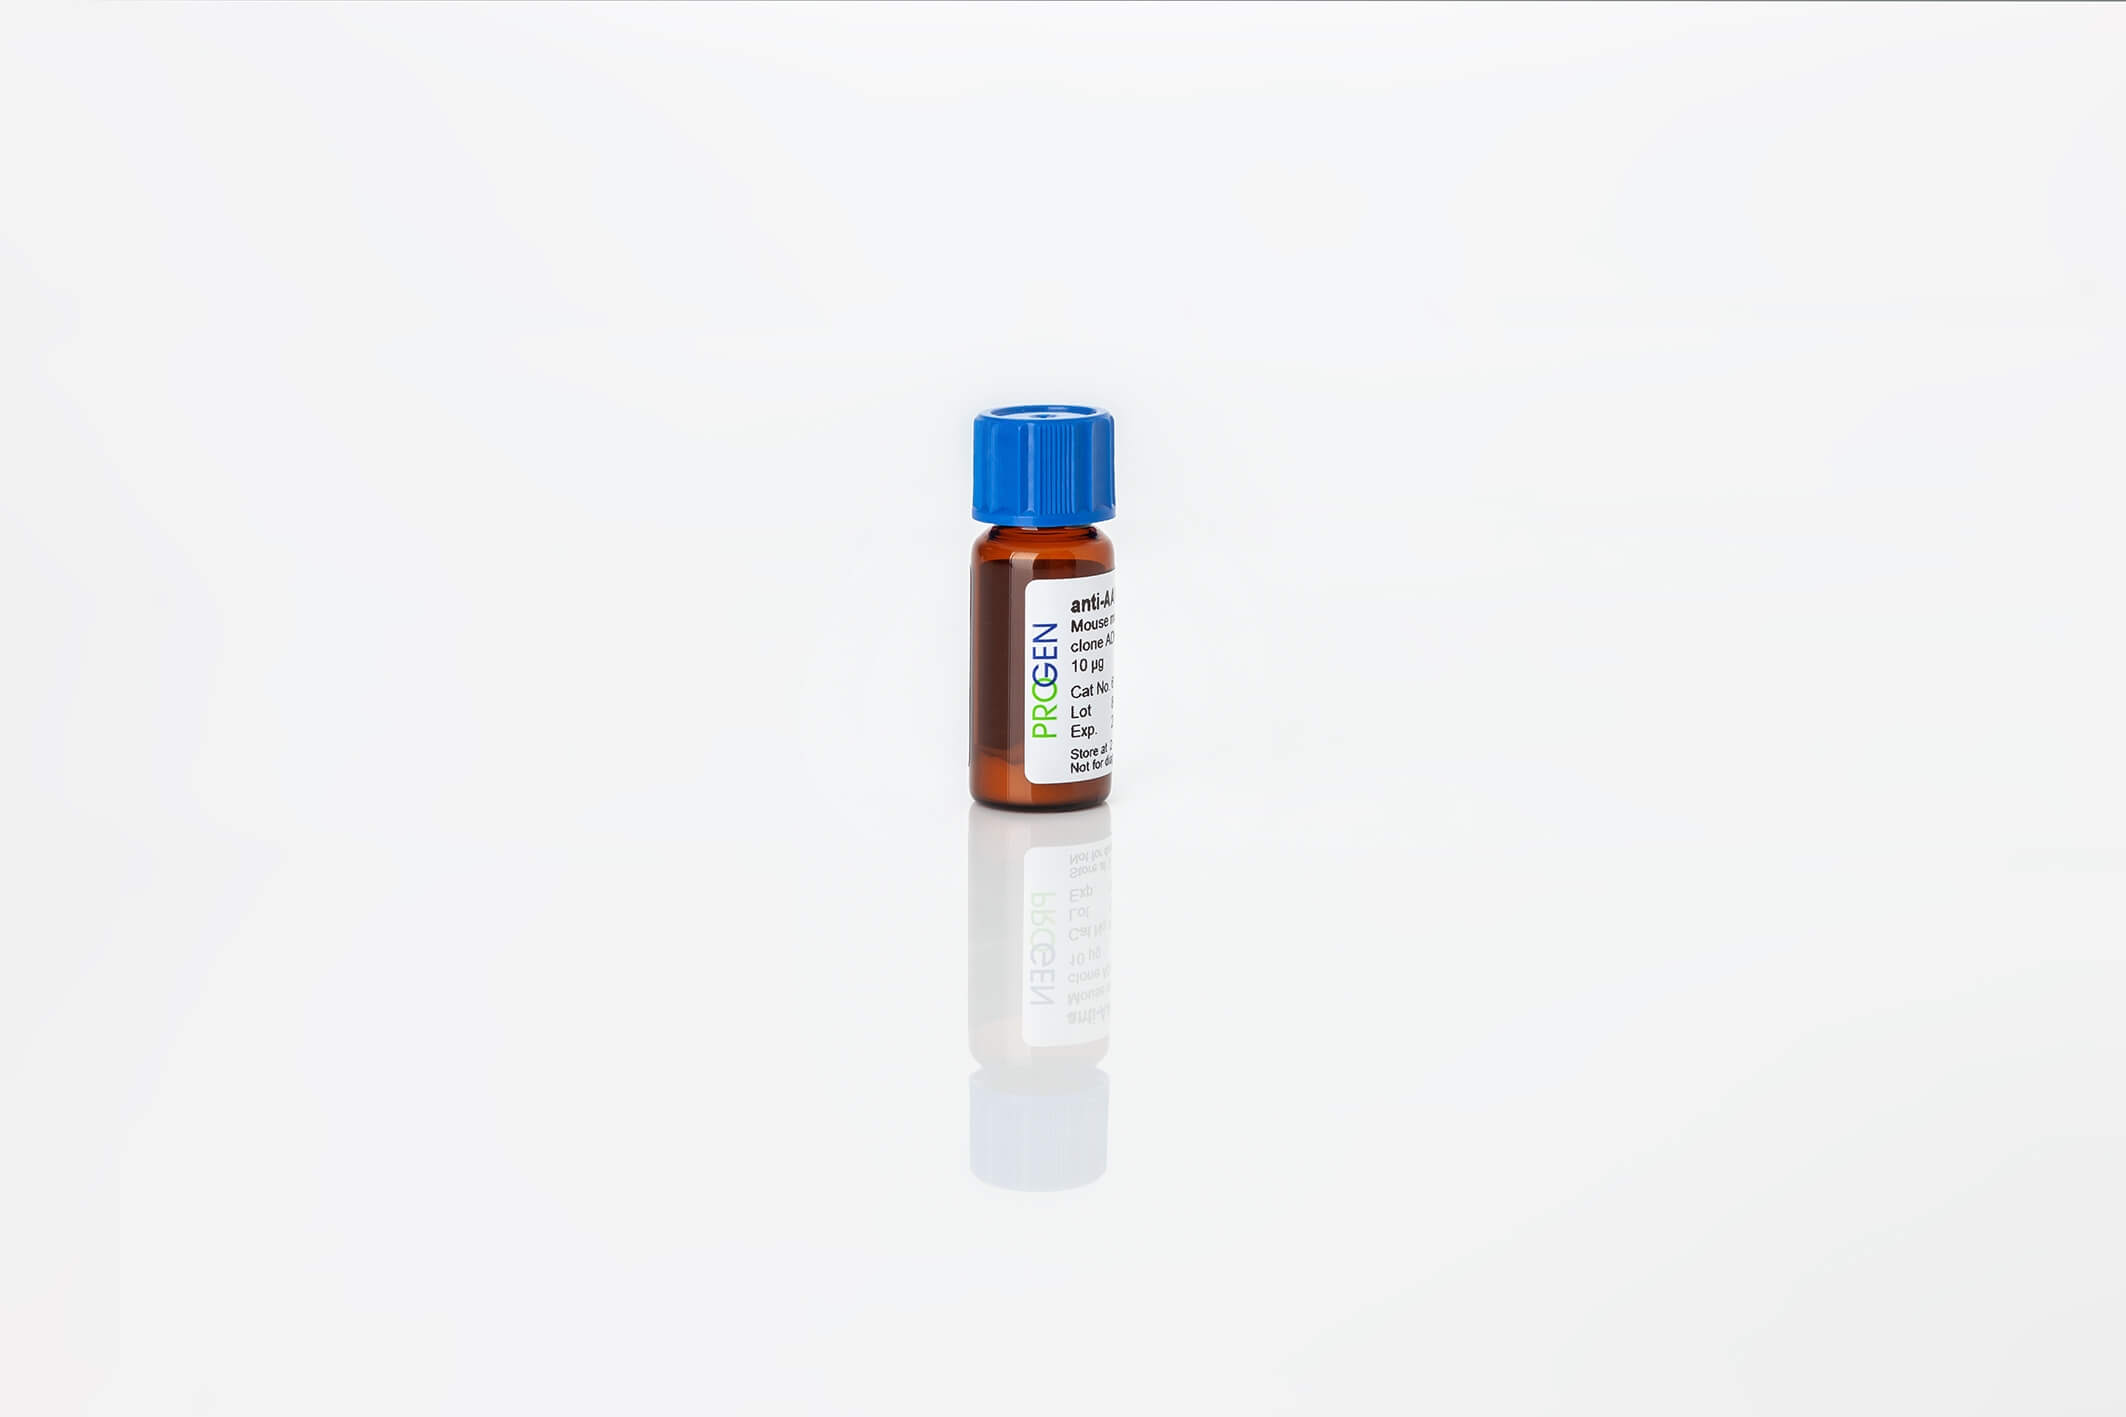 anti-Motilin rabbit polyclonal, serum